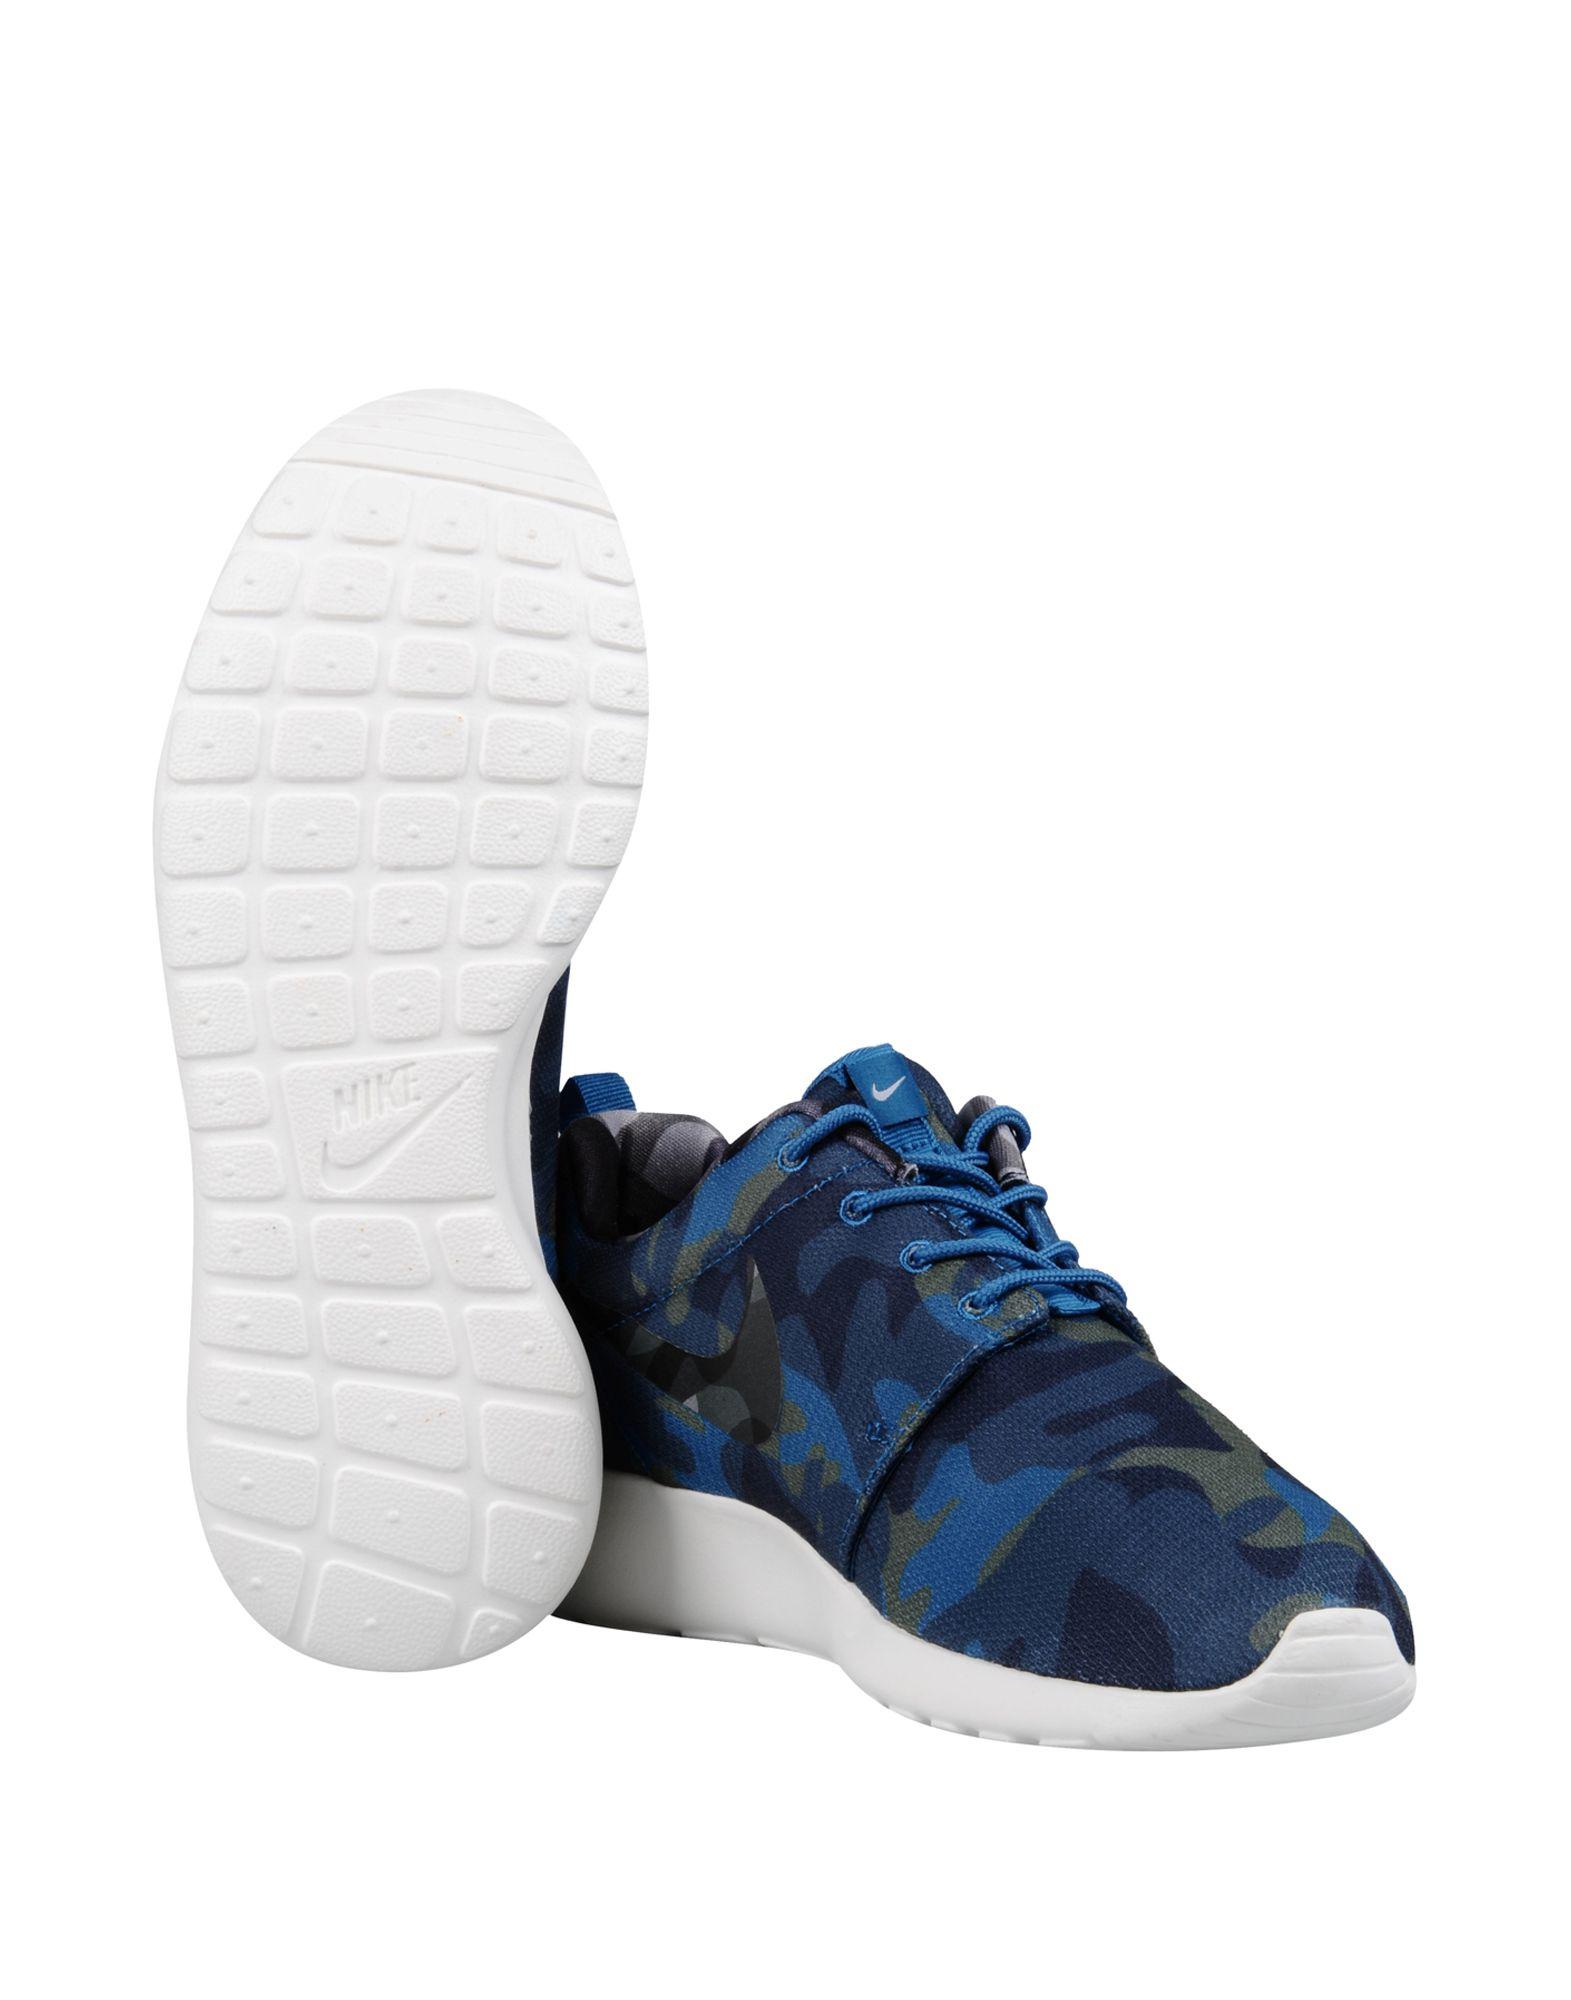 Nike Wmns Nike Roshe One Print  44960944KO 44960944KO 44960944KO Gute Qualität beliebte Schuhe c10302